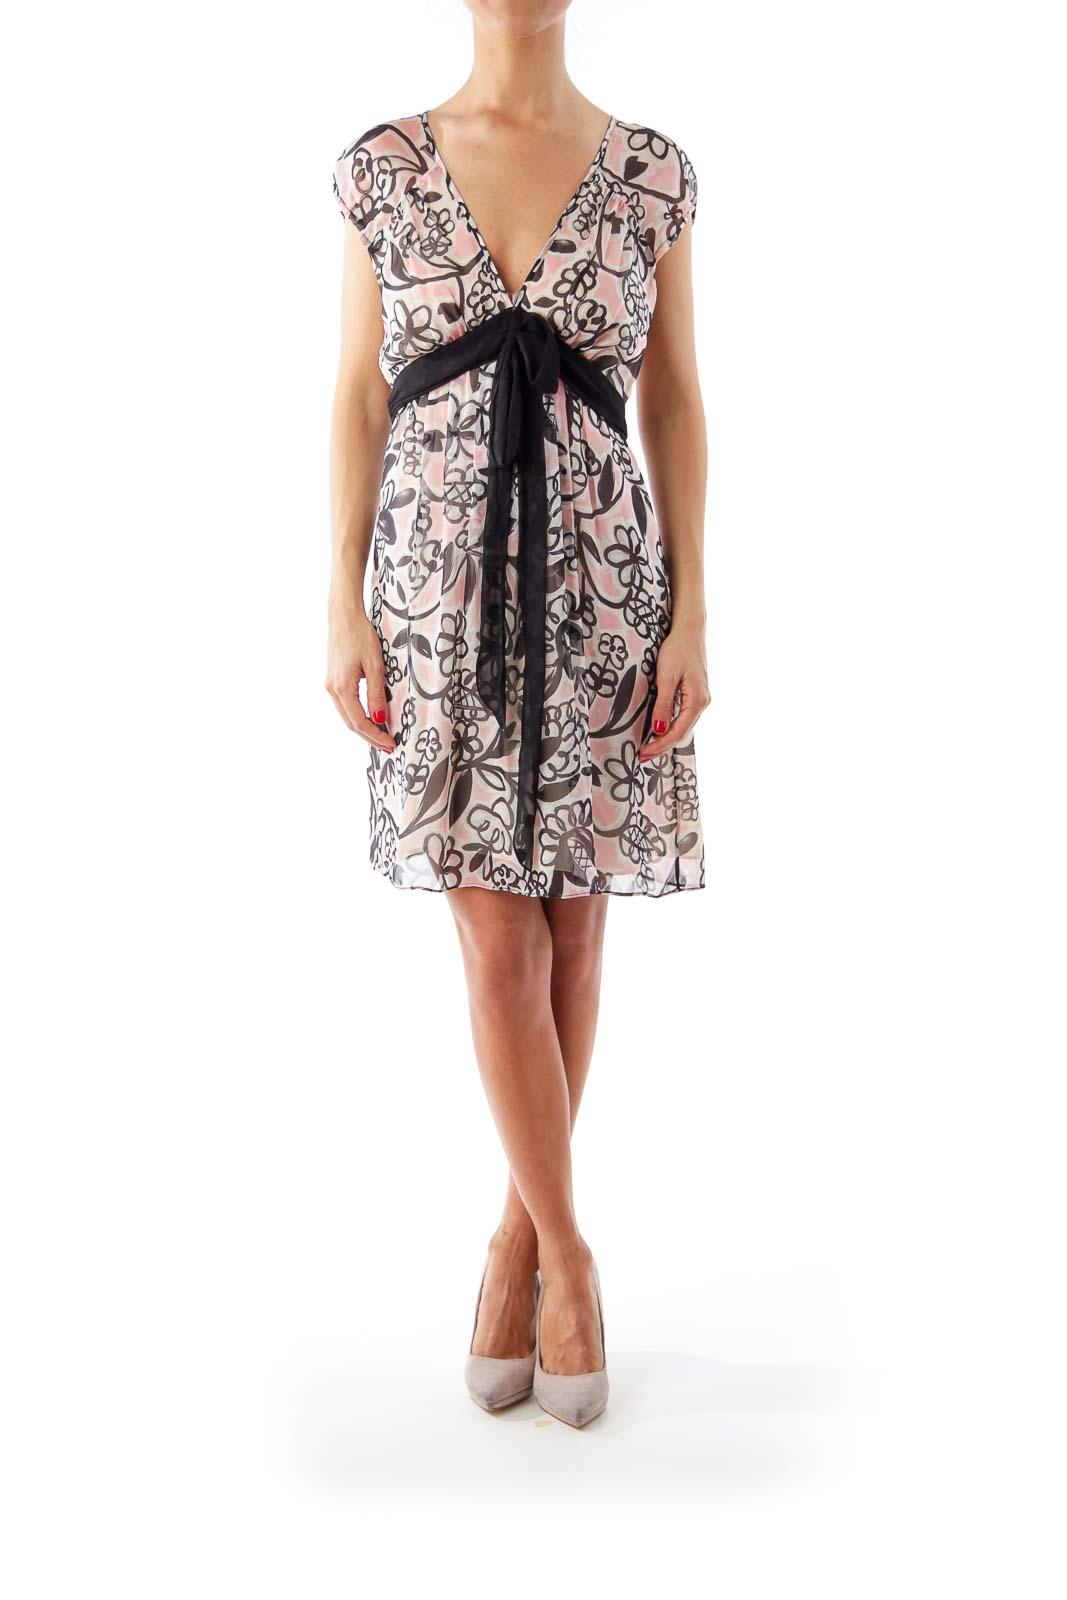 Pink & Black Floral Print Dress